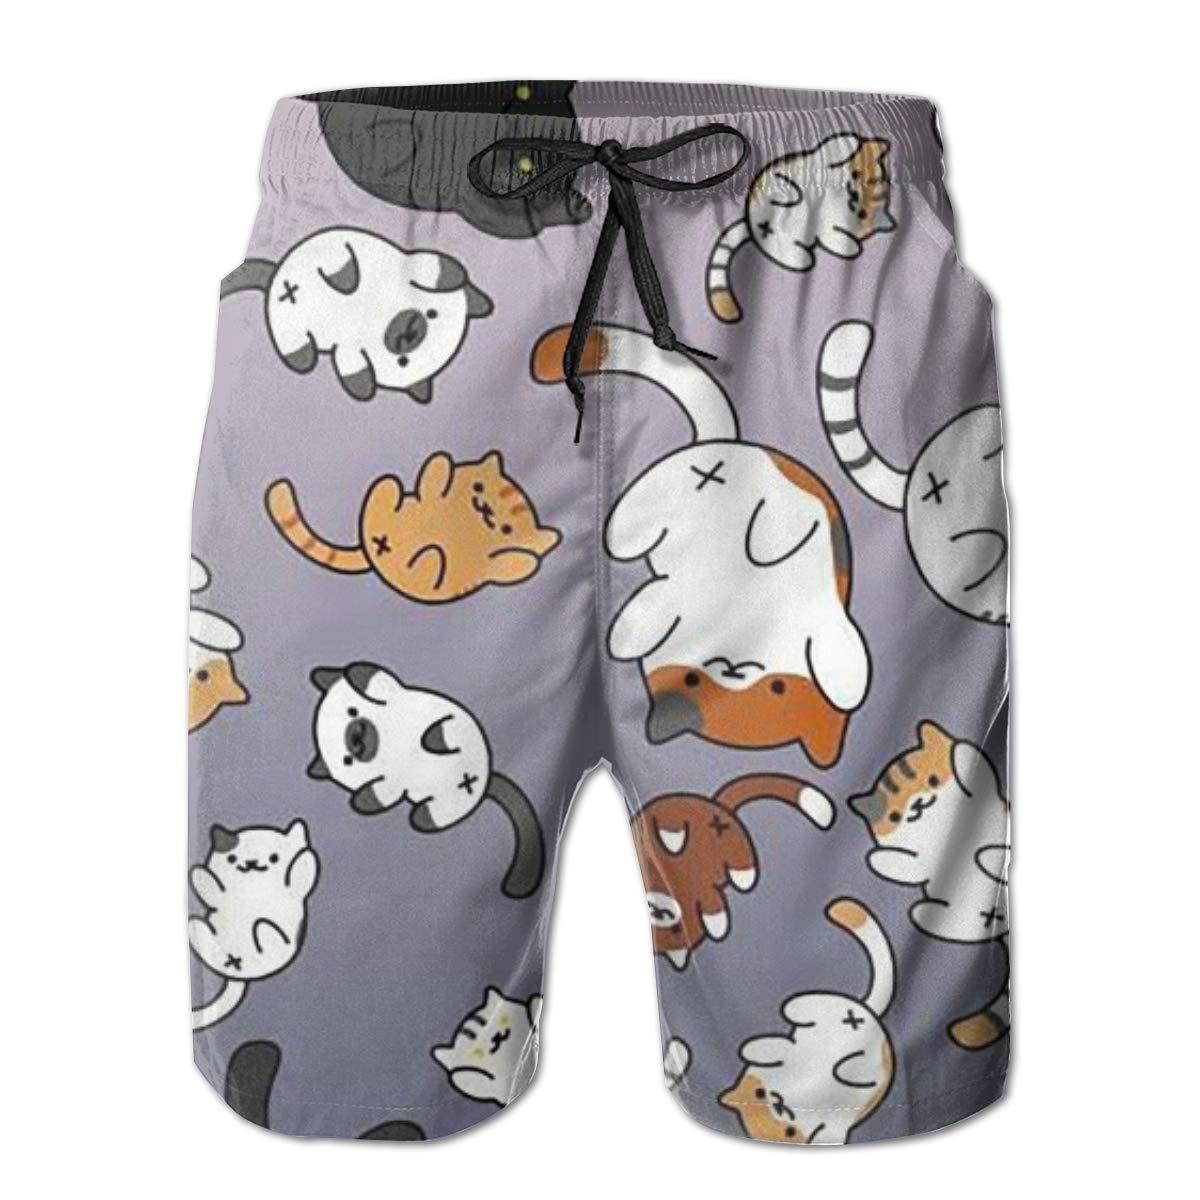 Mens Swim Trunks Quick Dry Summer Holiday Beach Shorts with Mesh Lining Cat Cat Cat Beachwear